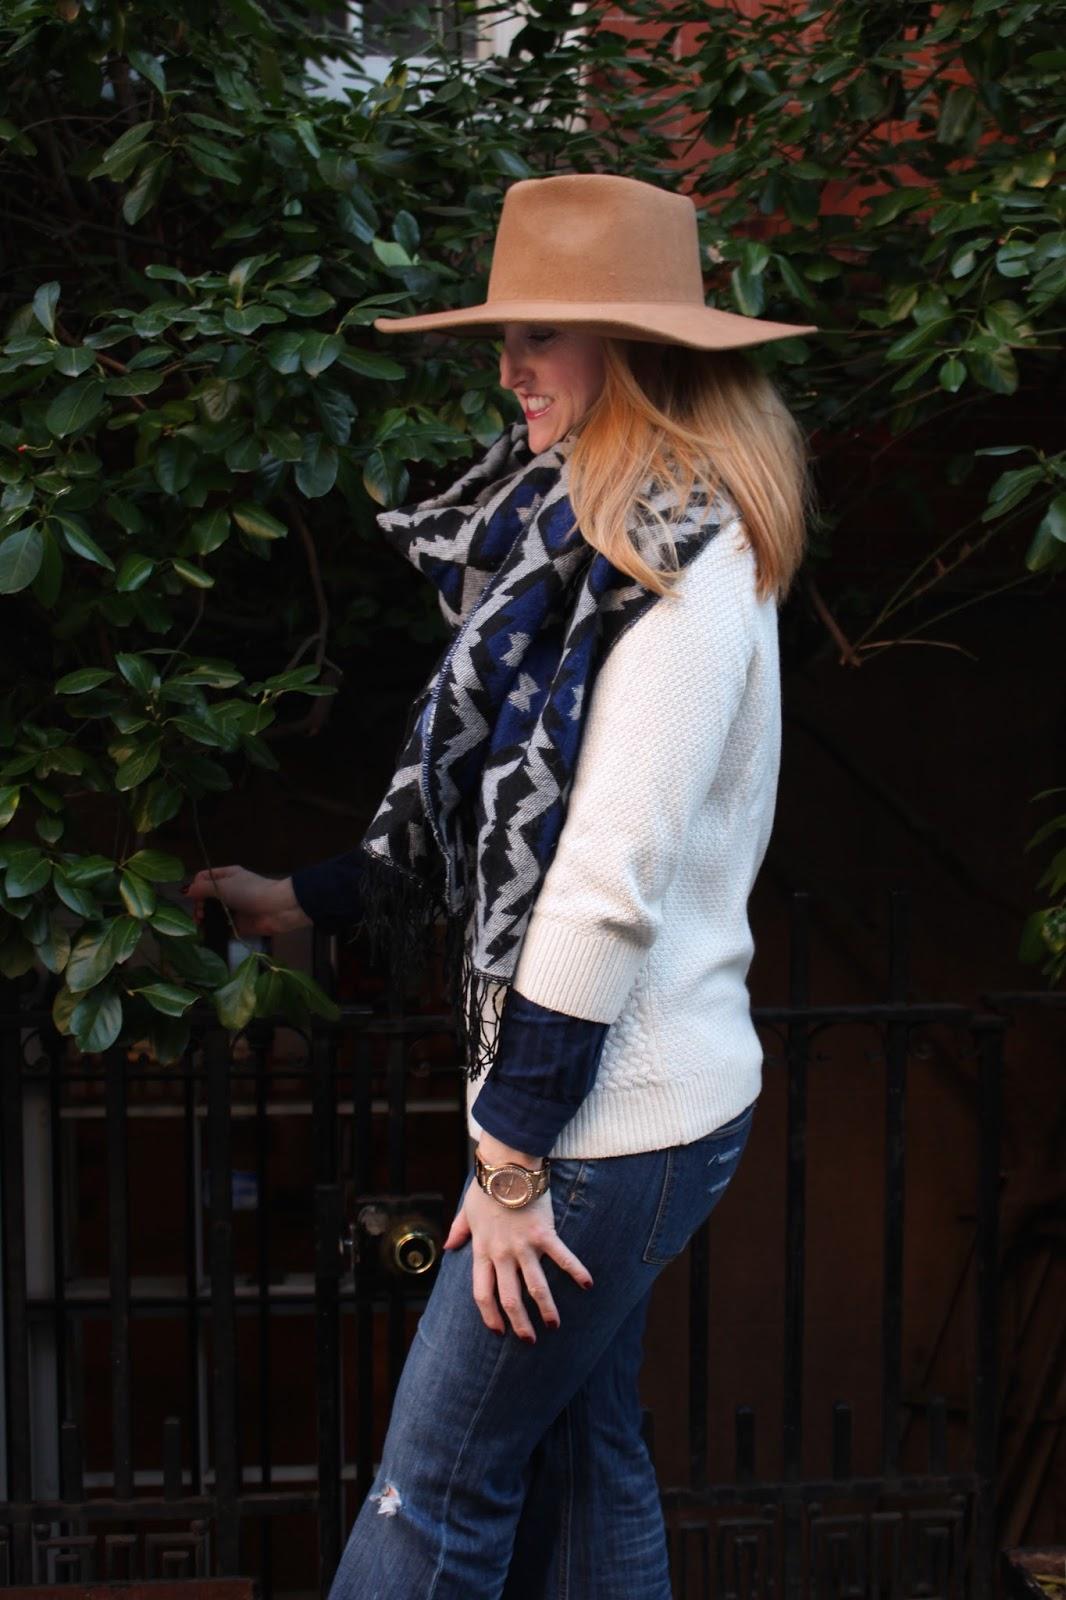 9ced9af62a9a6 Hat  Reiss London   Jacket  Zara   Sweater   Shirt  Loft   Jeans   Victoria s Secret   Necklace  J.Crew   Scarf  H M